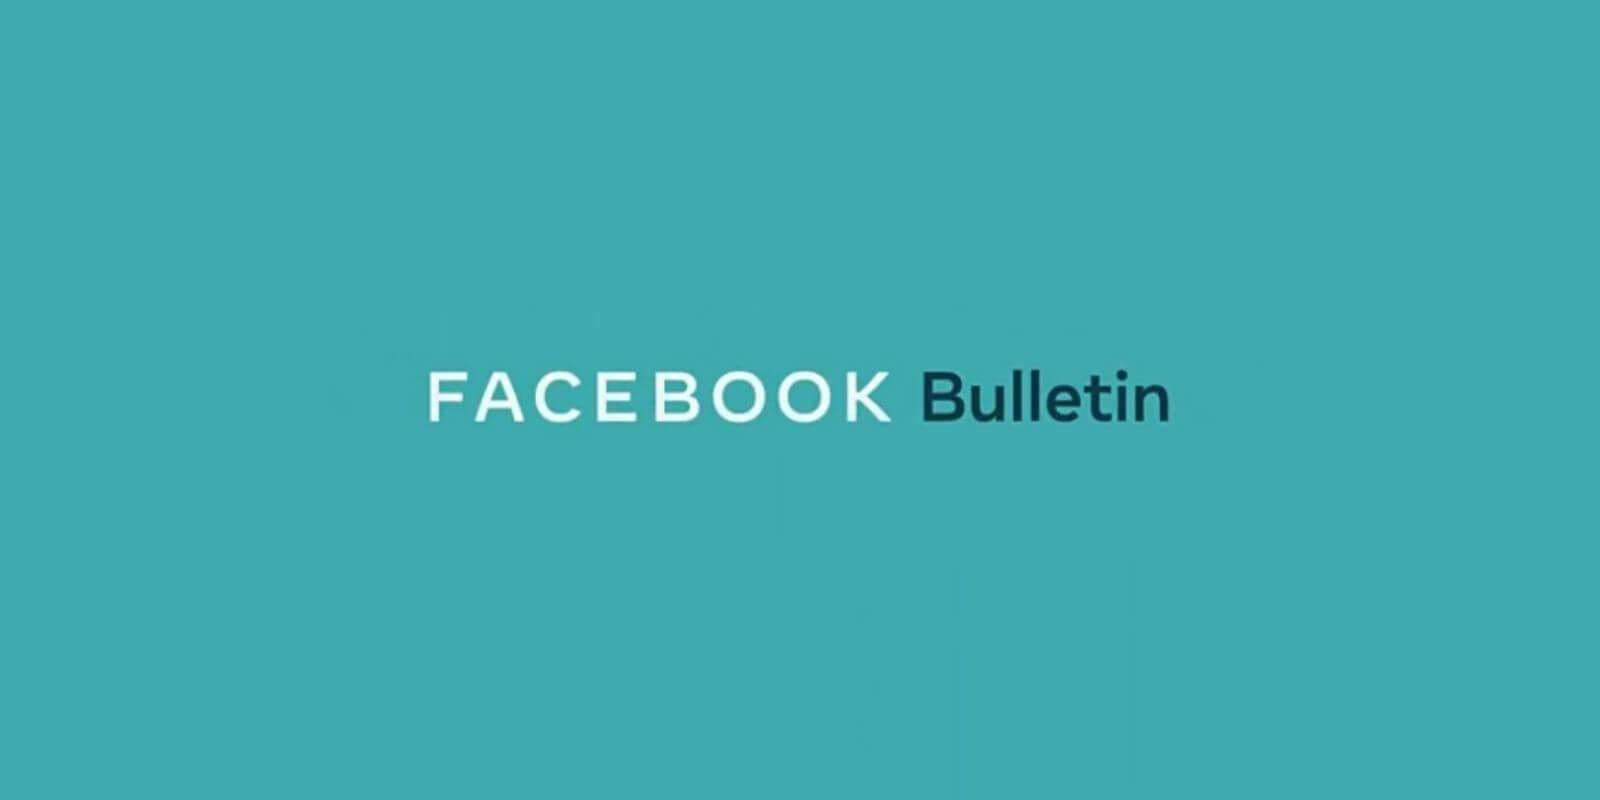 Facebook Bulletin- The latest newsletter platform